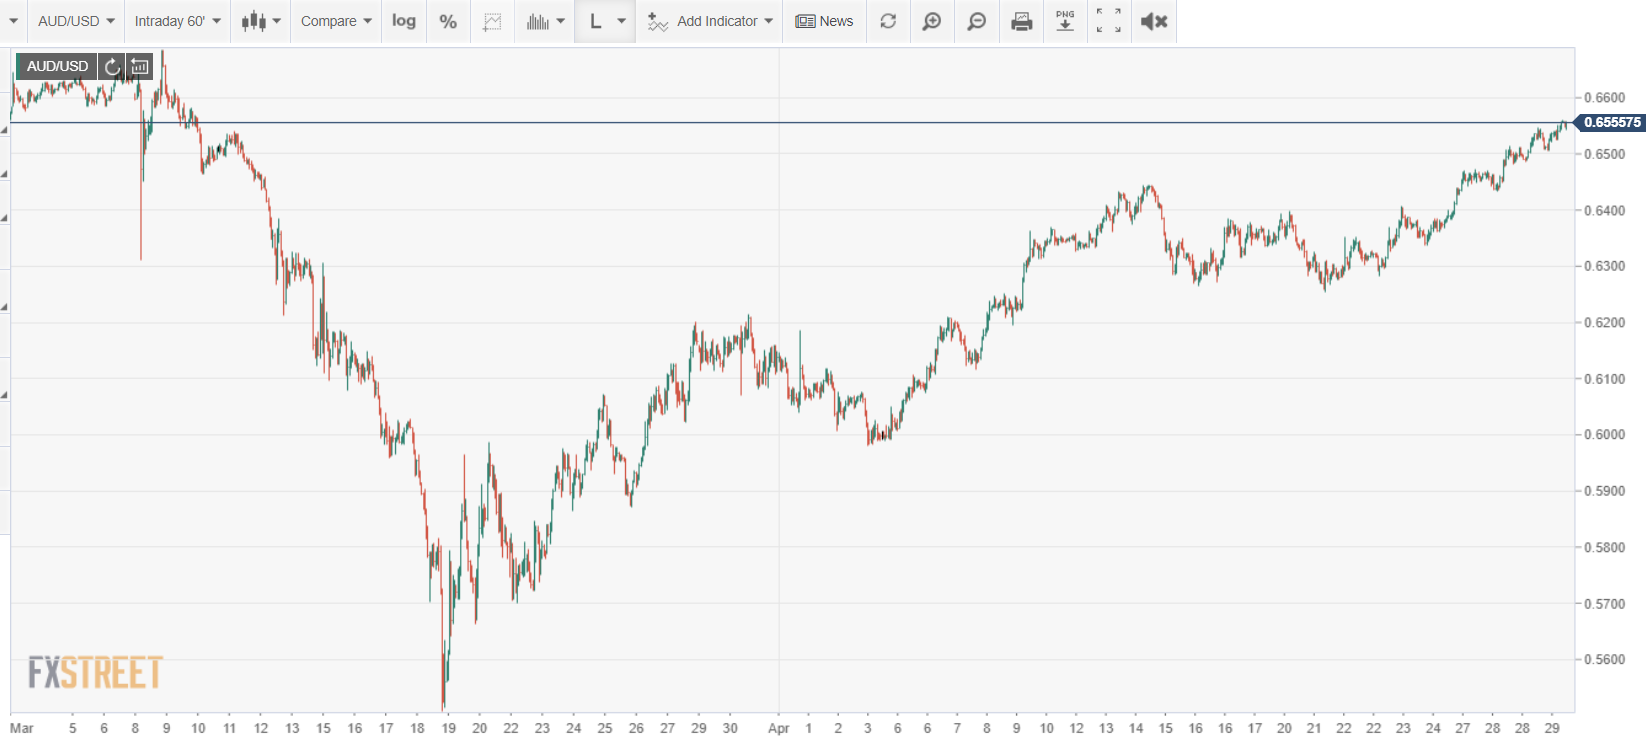 FXStreet AUDUSD Intraday Chart - 30 April 2020